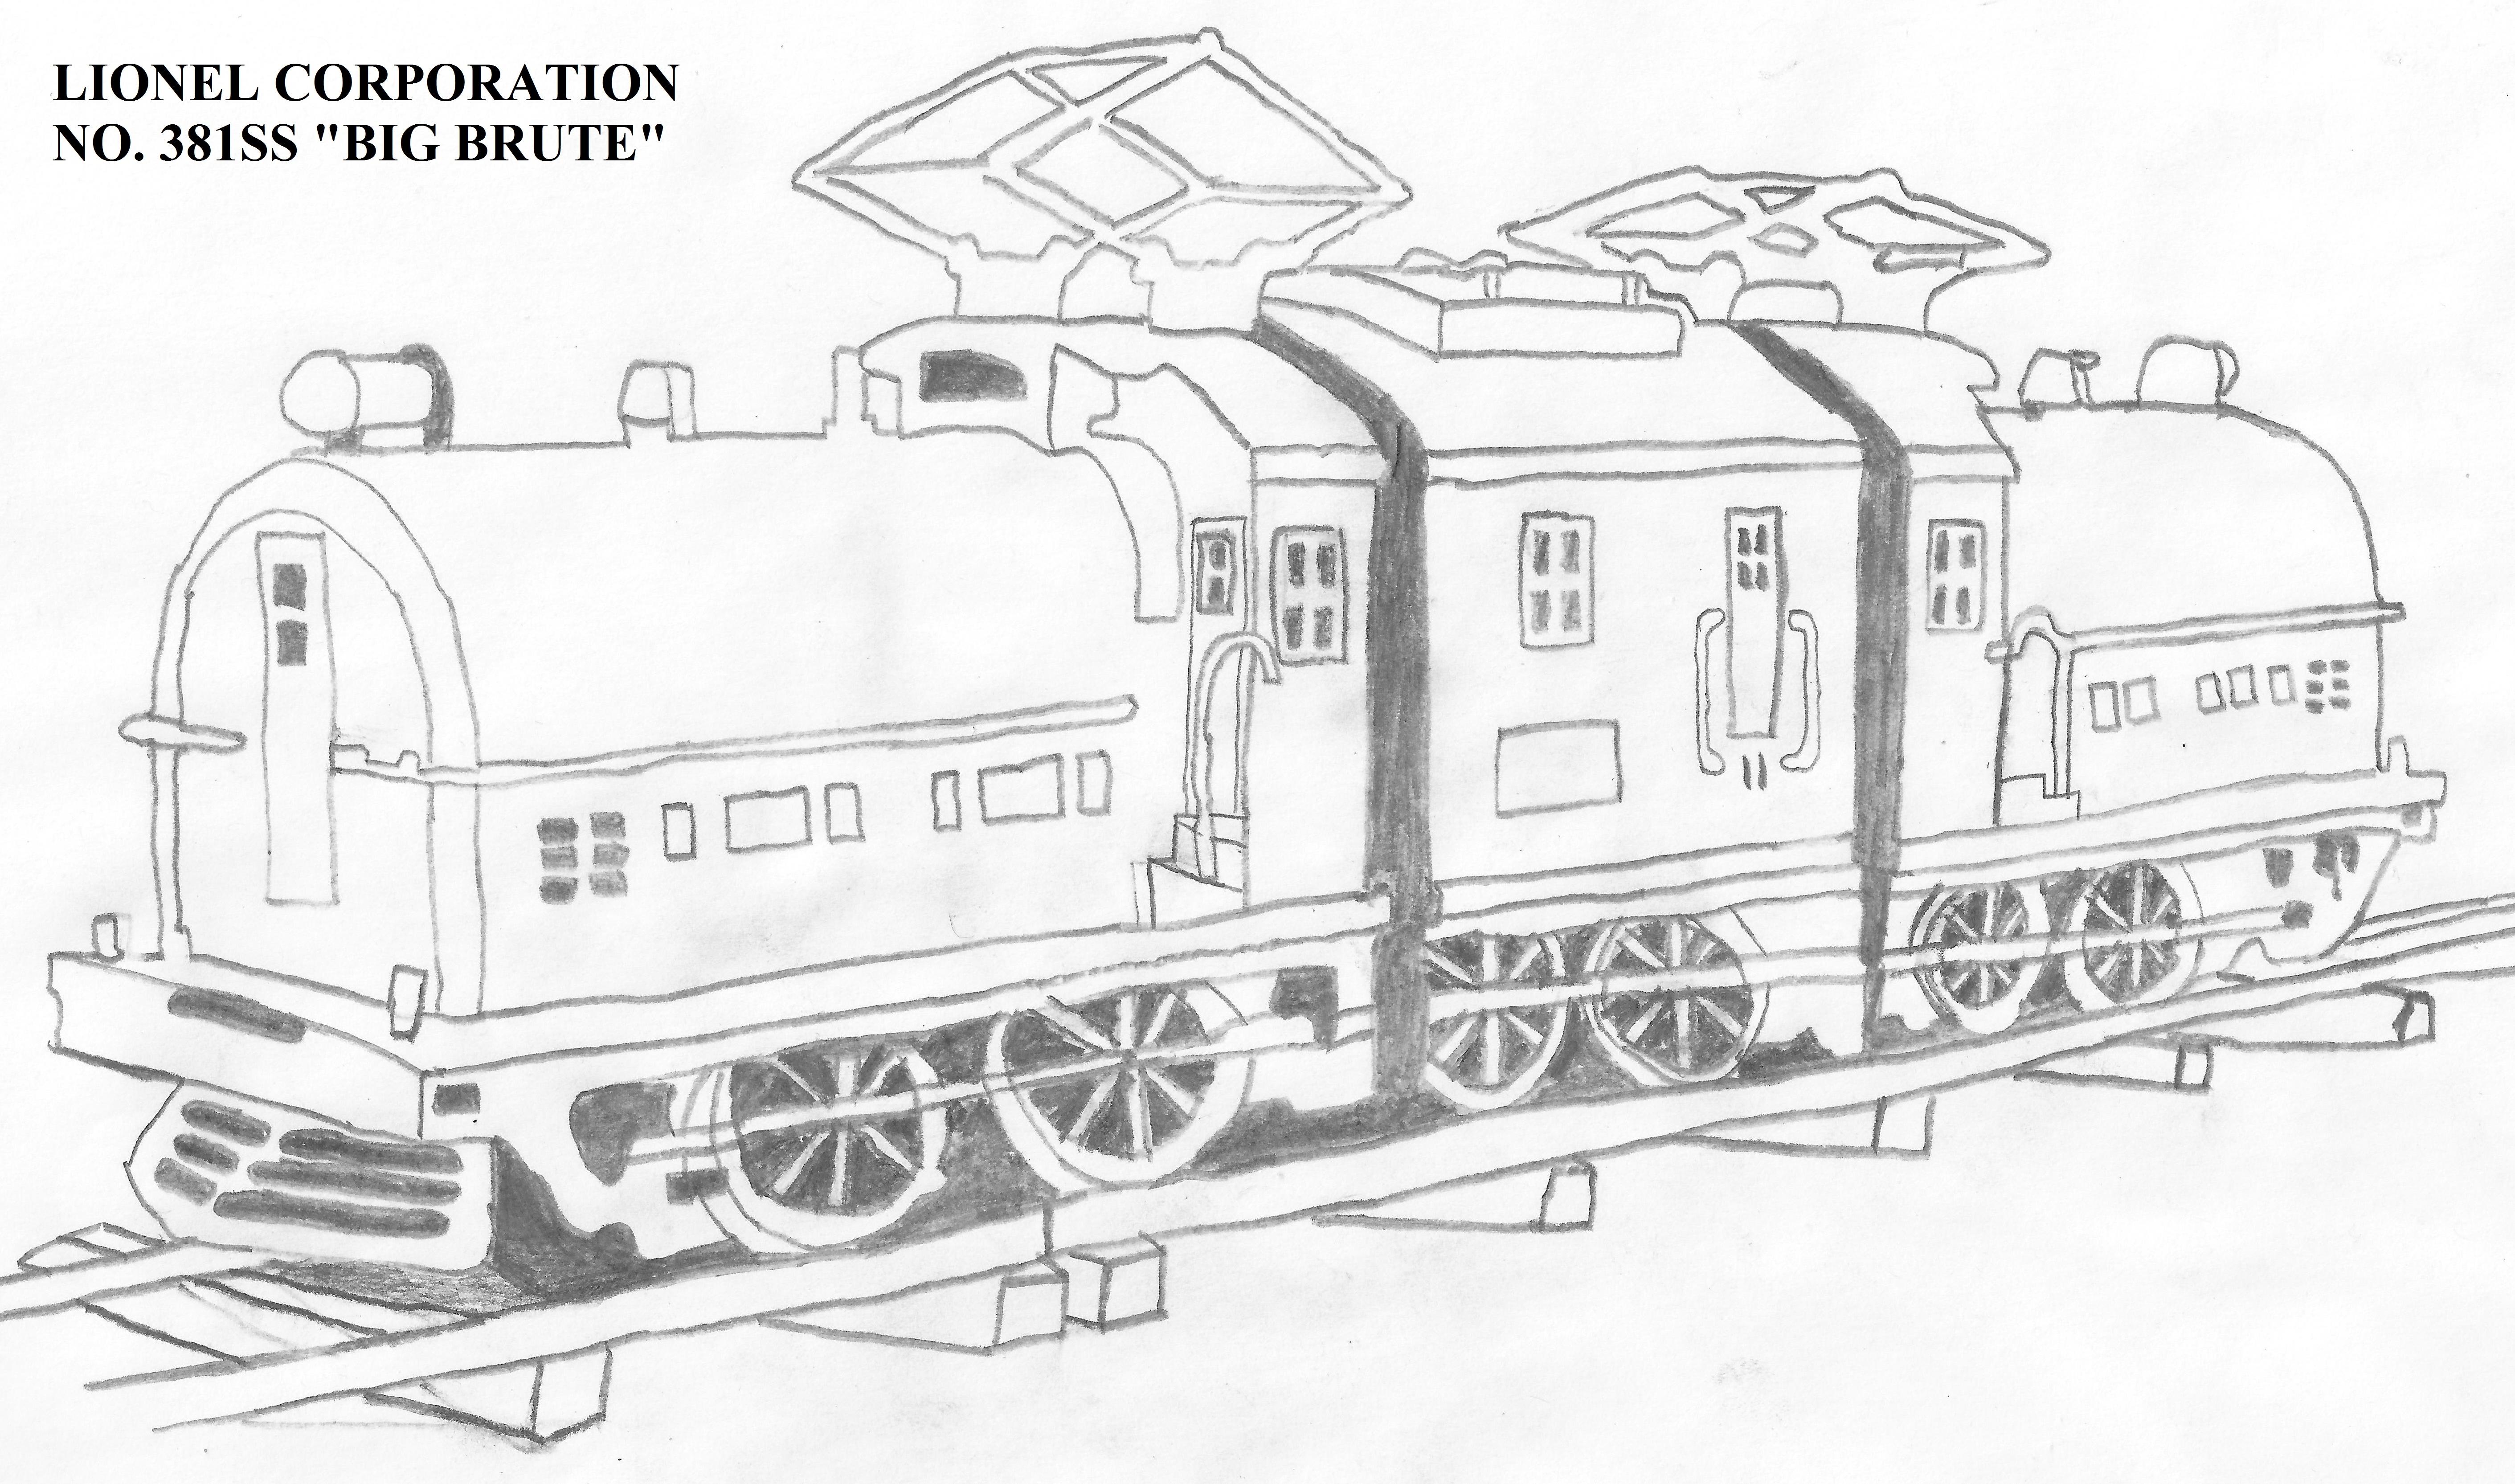 My Drawing Of The Lionel Standard Gauge Big Brute